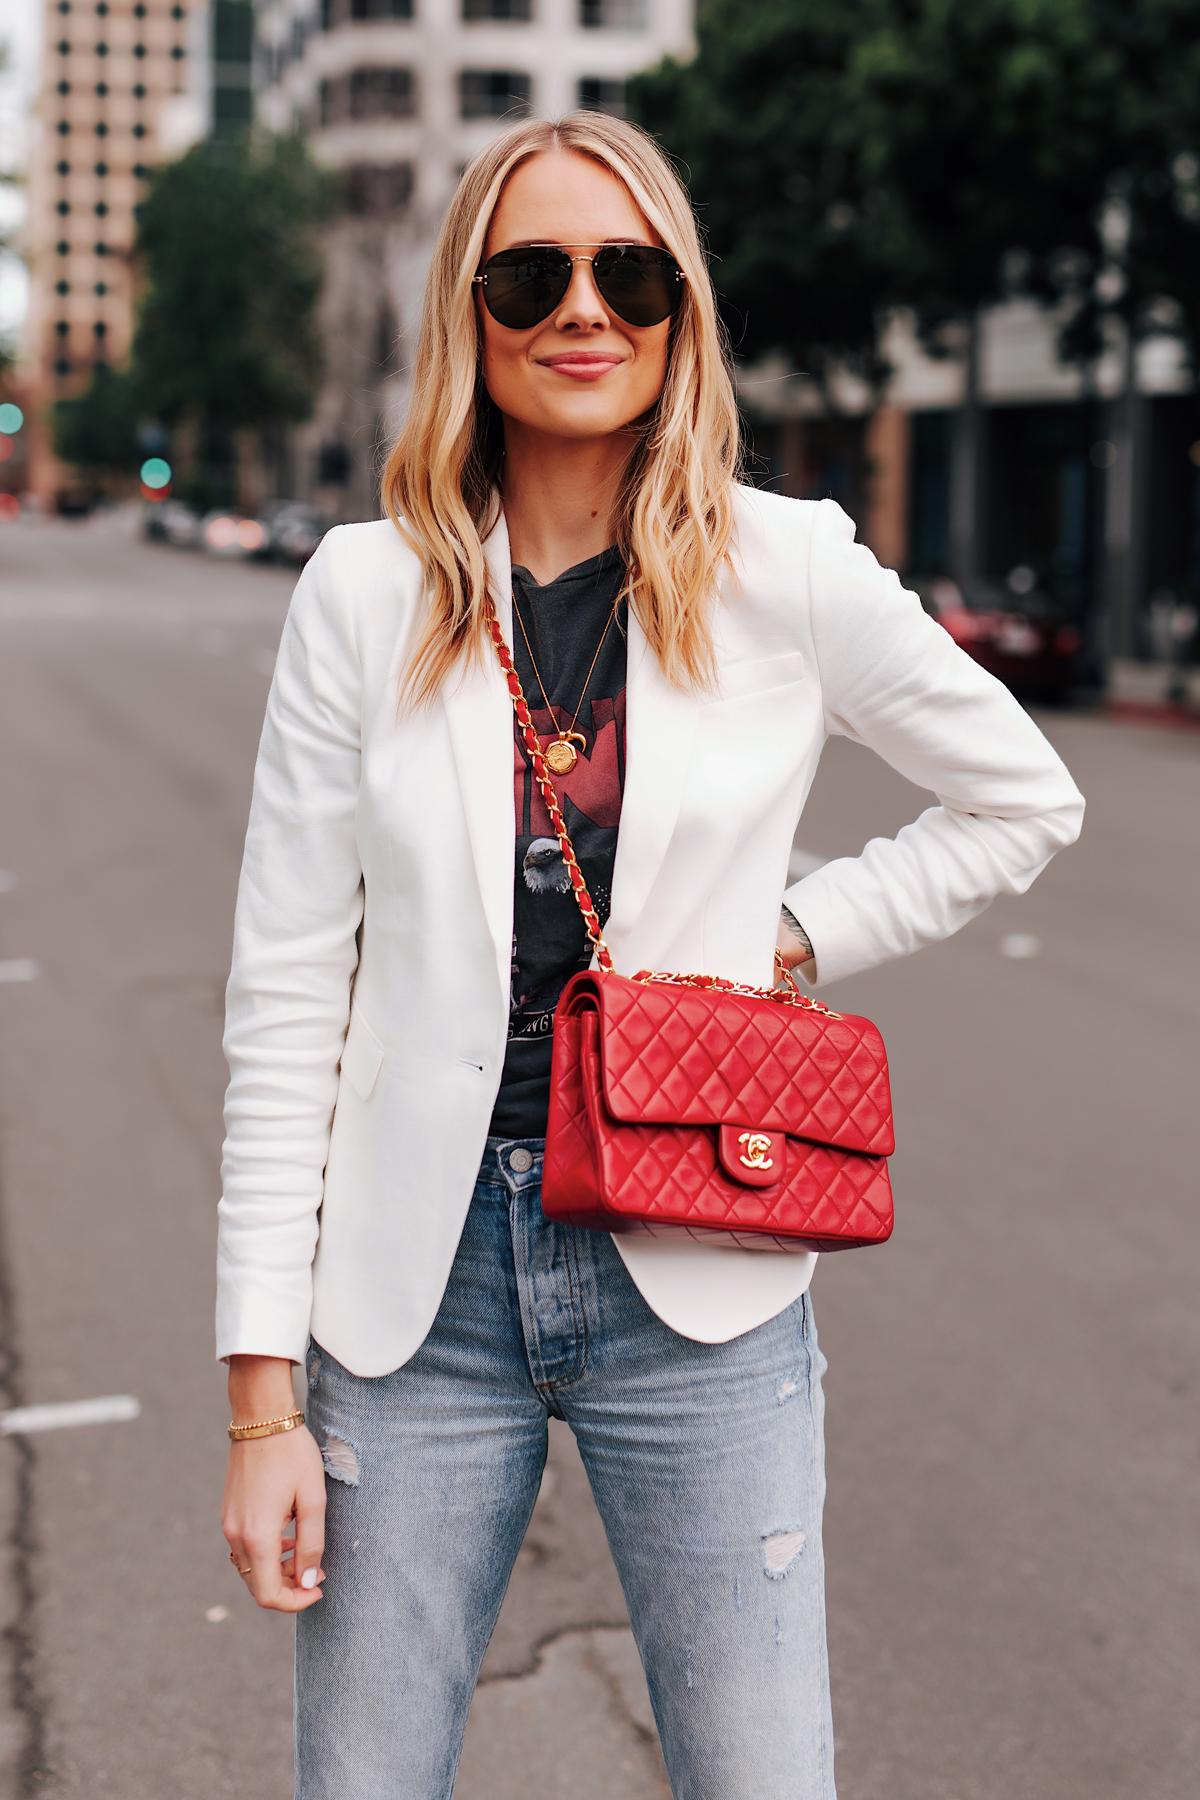 Blonde Woman Wearing White Blazer Anine Bing Graphic Tshirt Ripped Jeans Red Chanel Handbag Aviator Sunglasses Fashion Jackson San Diego Fashion Blogger Street Style